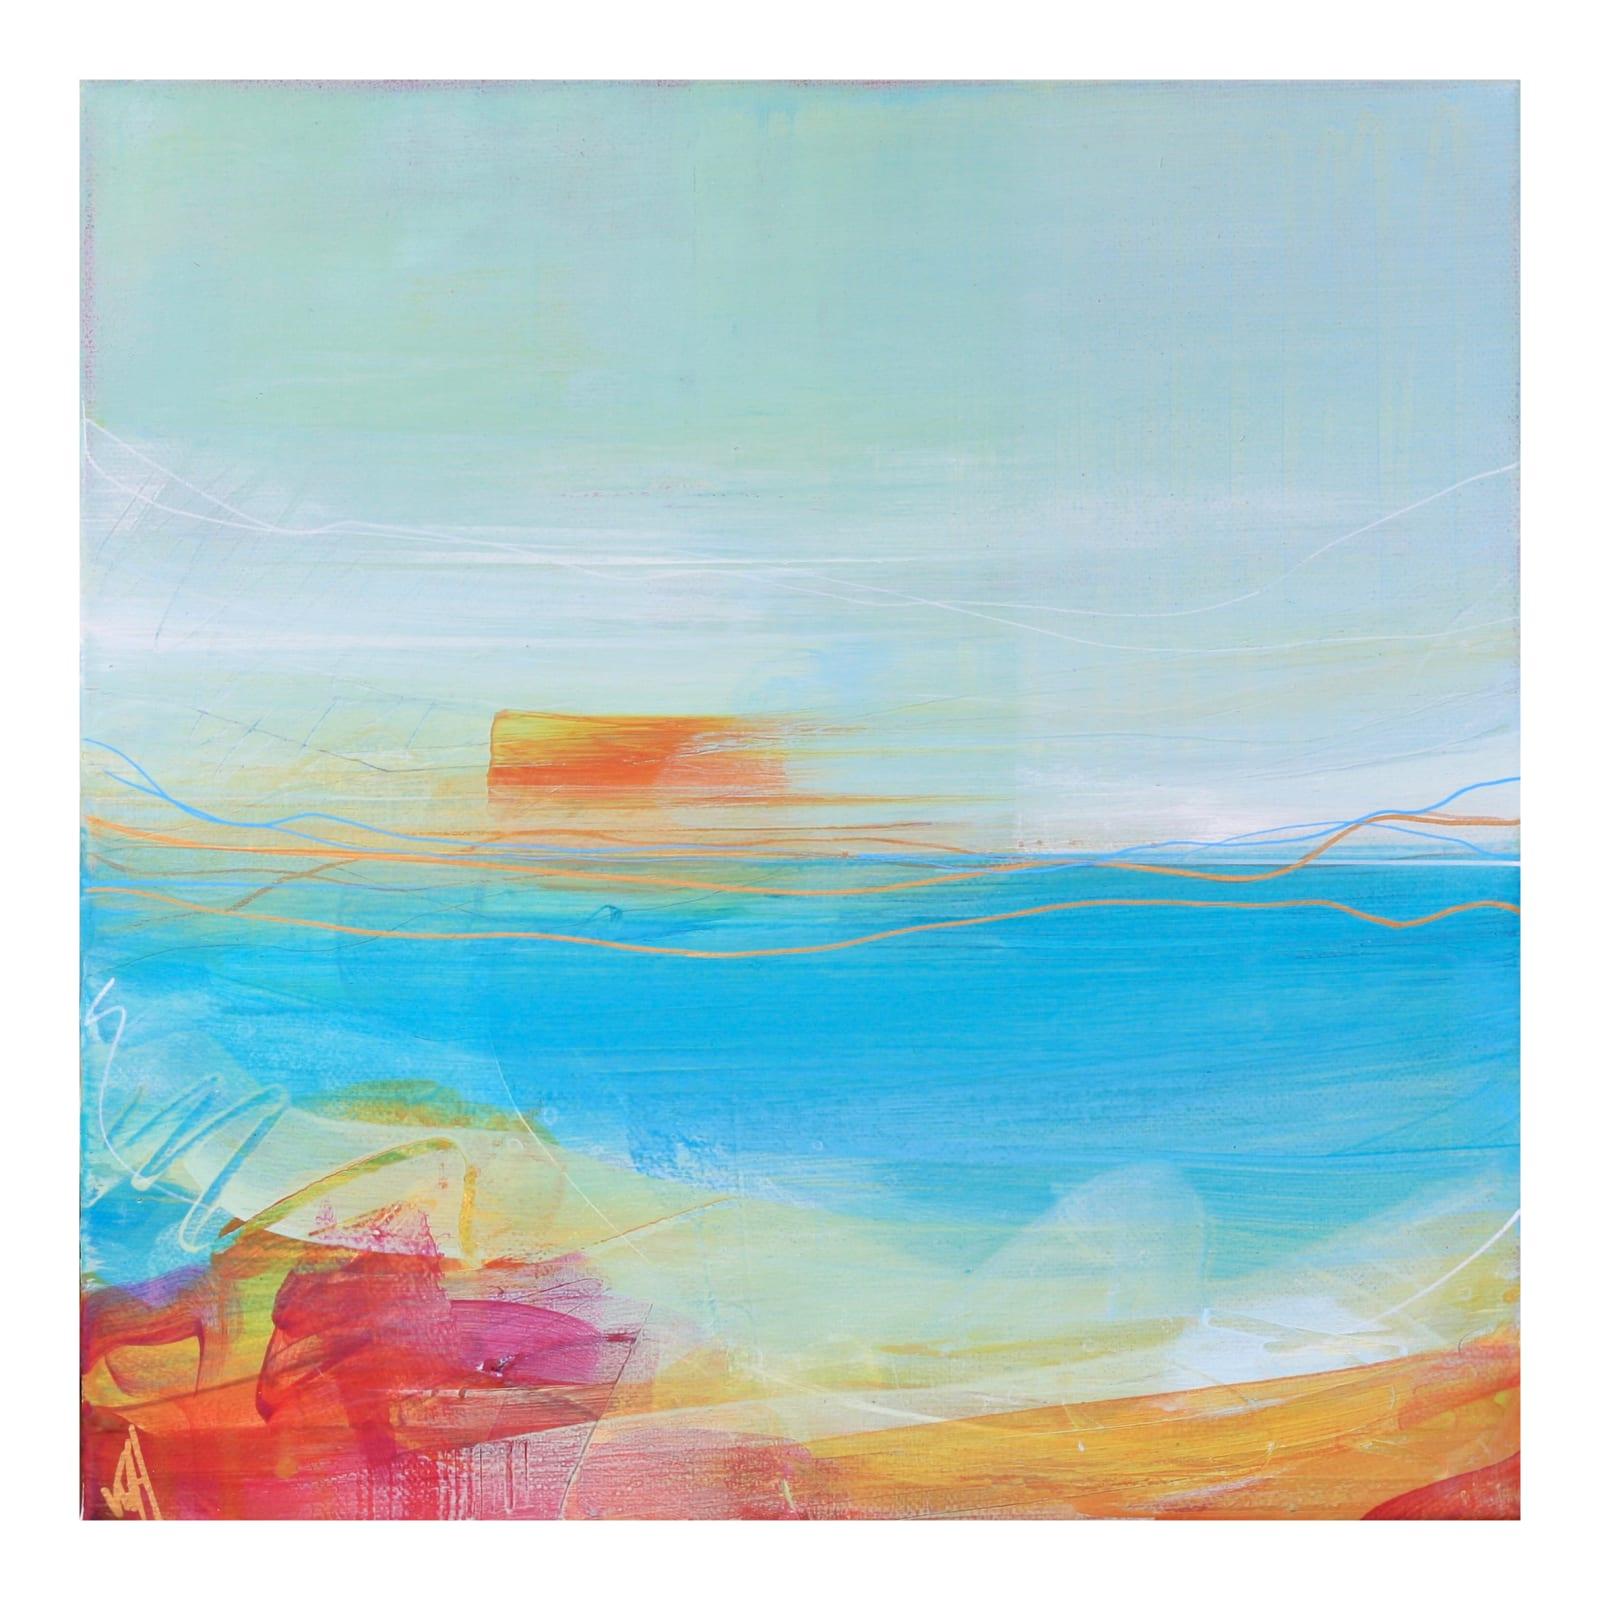 Victoria Wylie, Morning Song, Lunan Bay